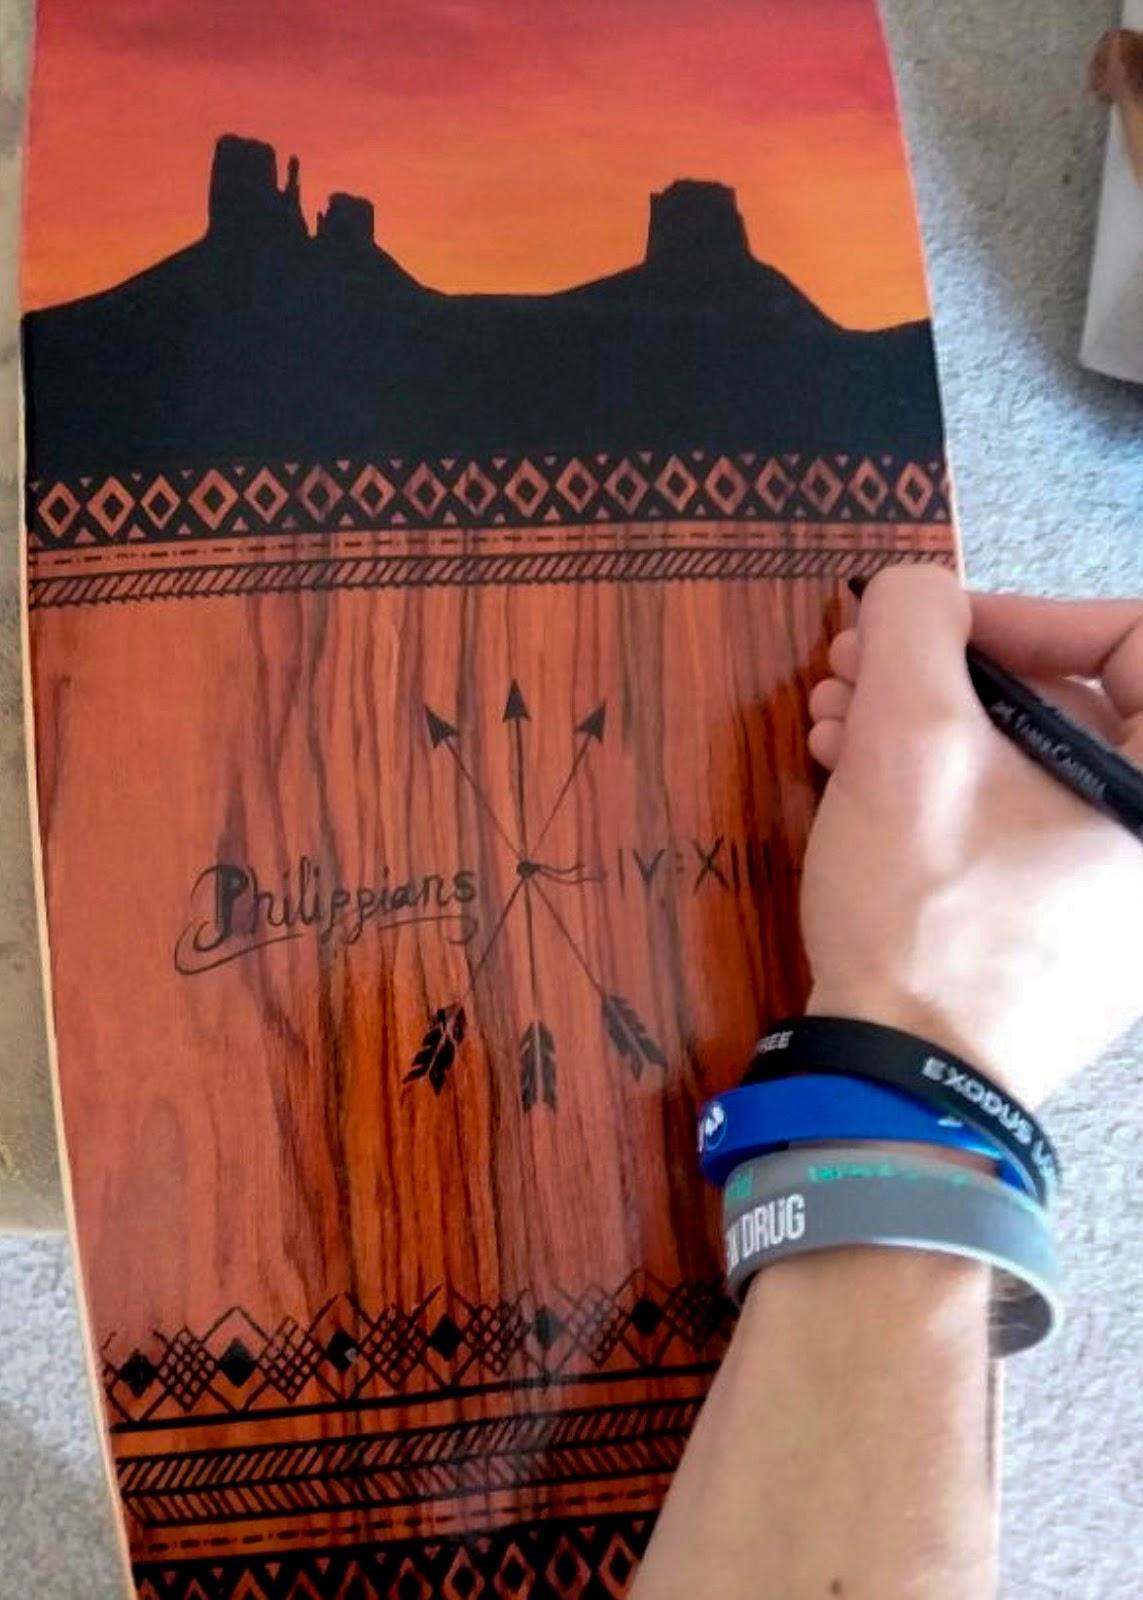 Shelly Stuckman, ArizonaGirl.com, Exodus Longboard Co, longboards, skateboards, longboarding, skateboarding,